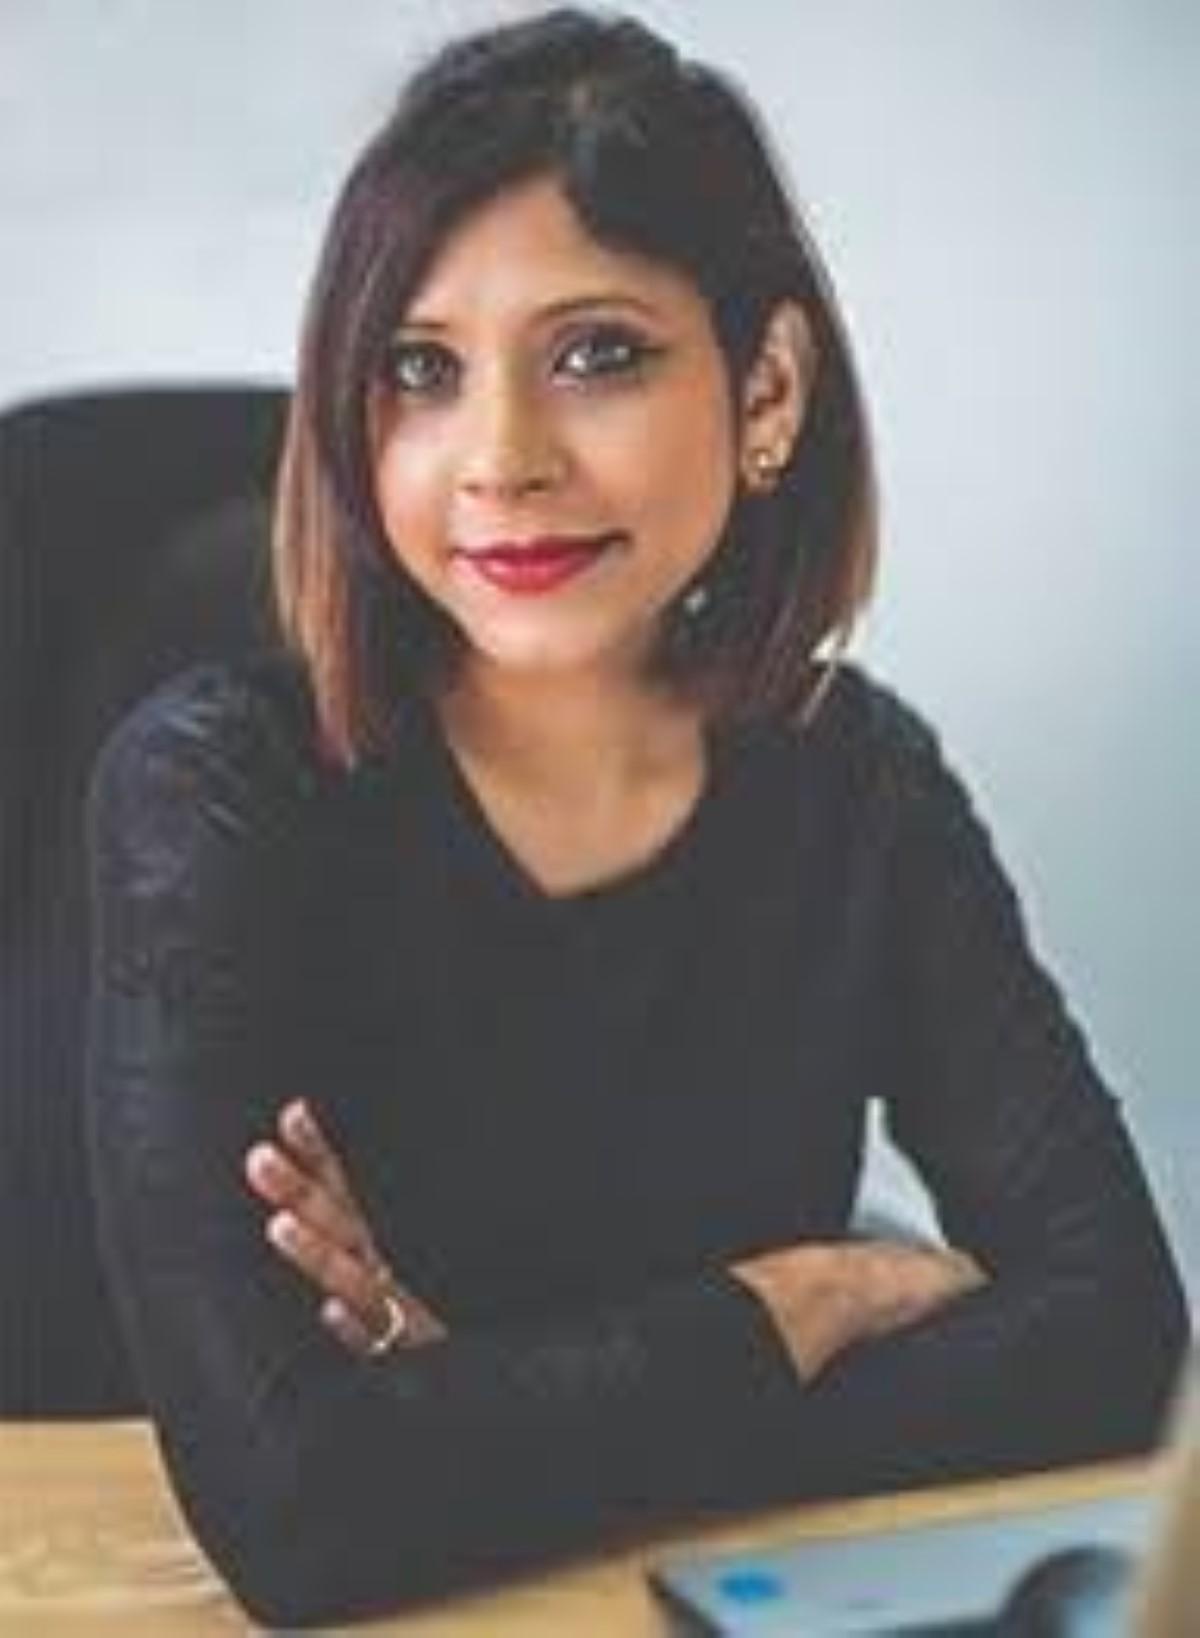 La rédactrice en chef, Zahira Radha